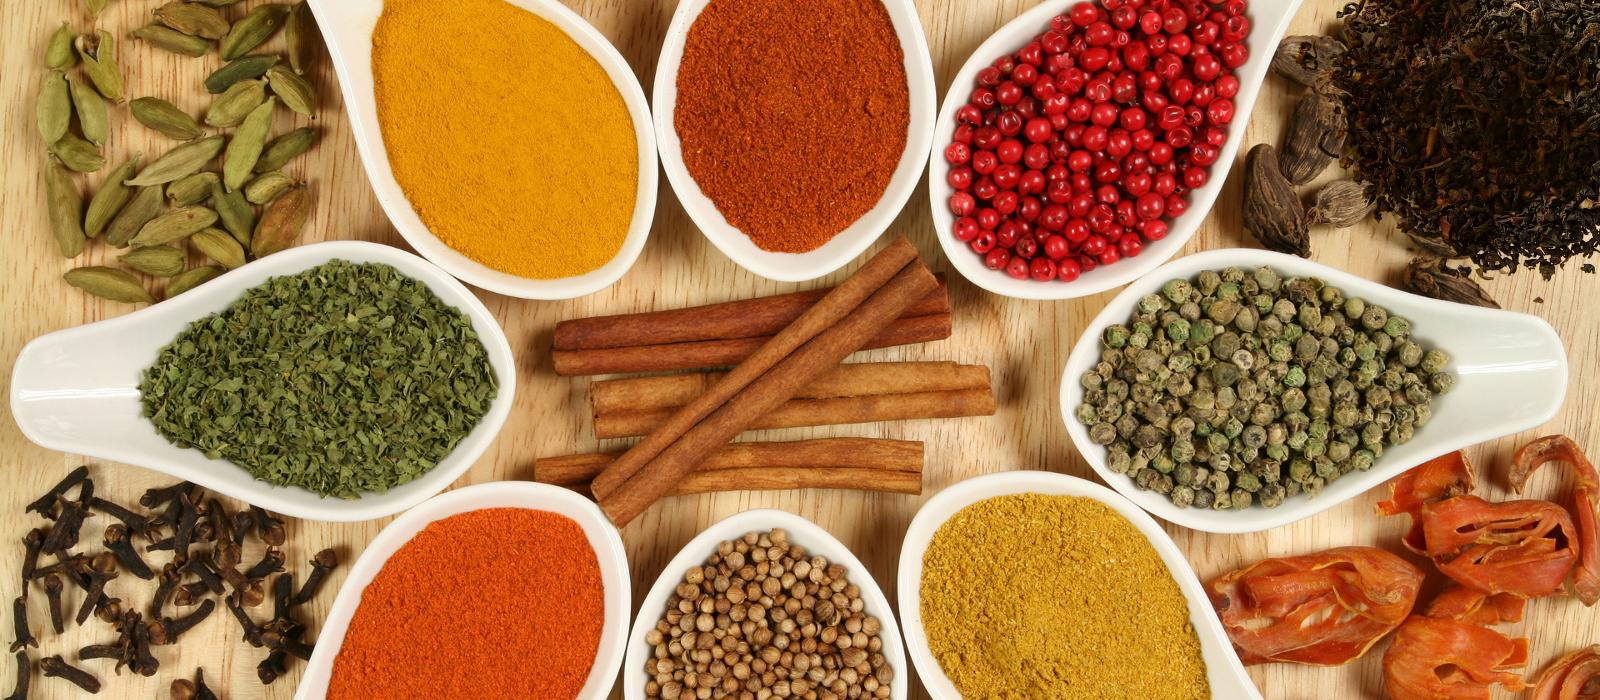 Tea and spices exports, Sri Lanka